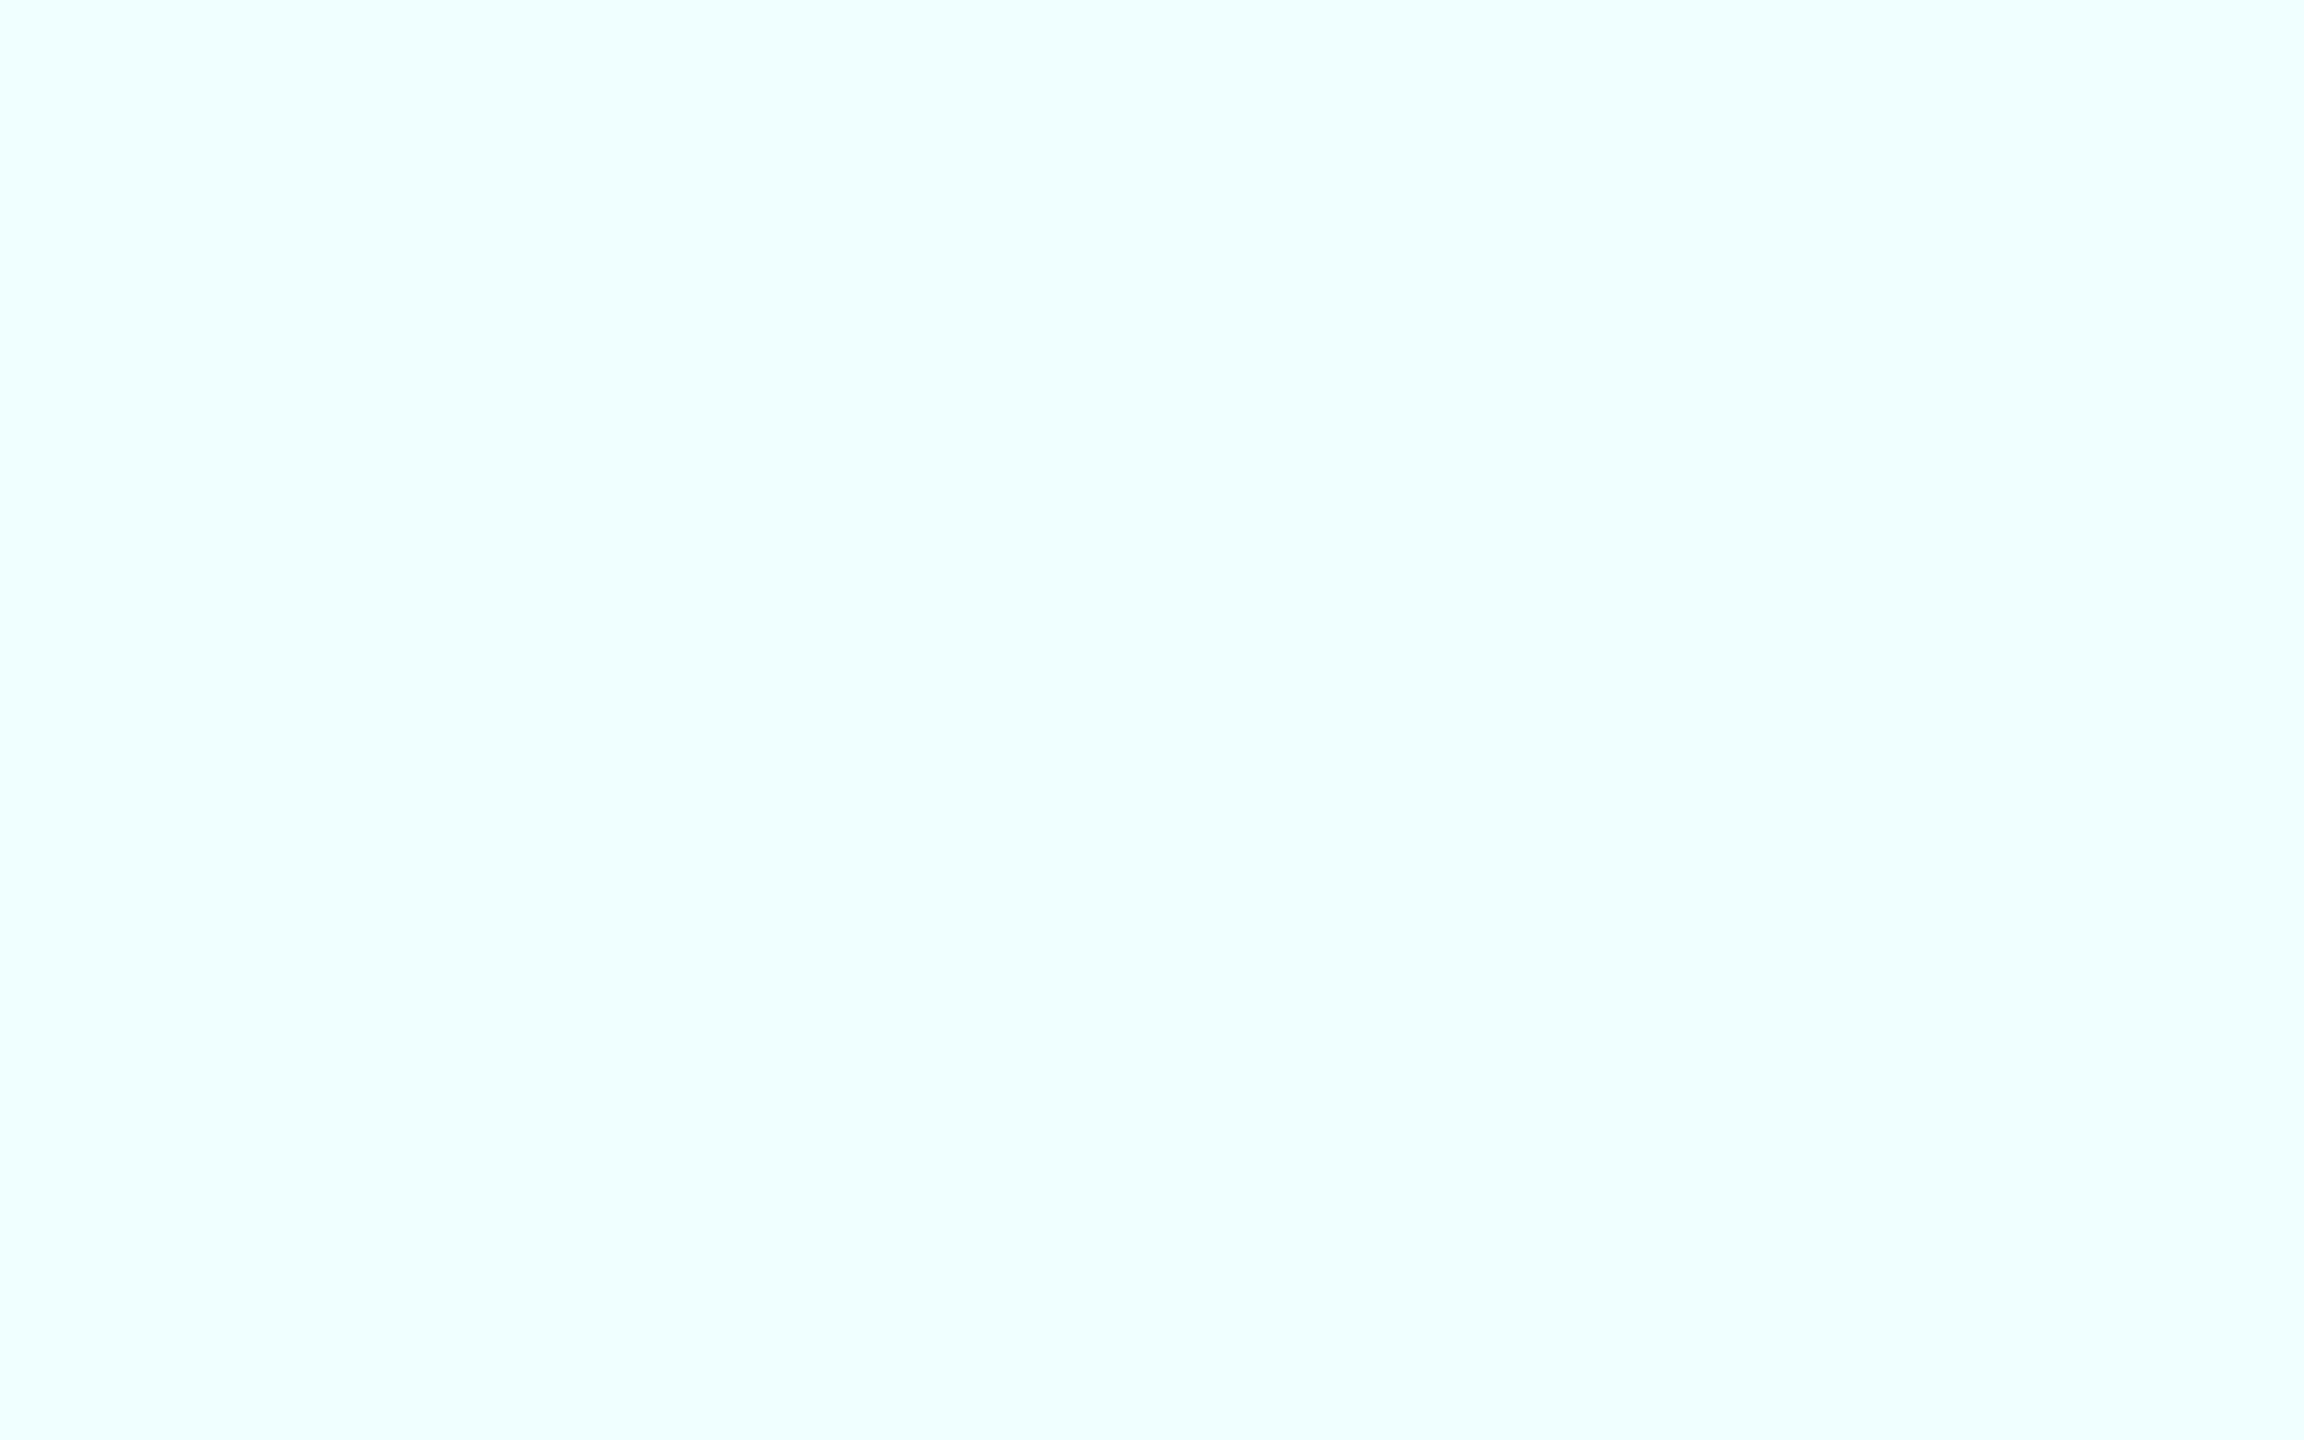 2304x1440 Azure Mist Solid Color Background